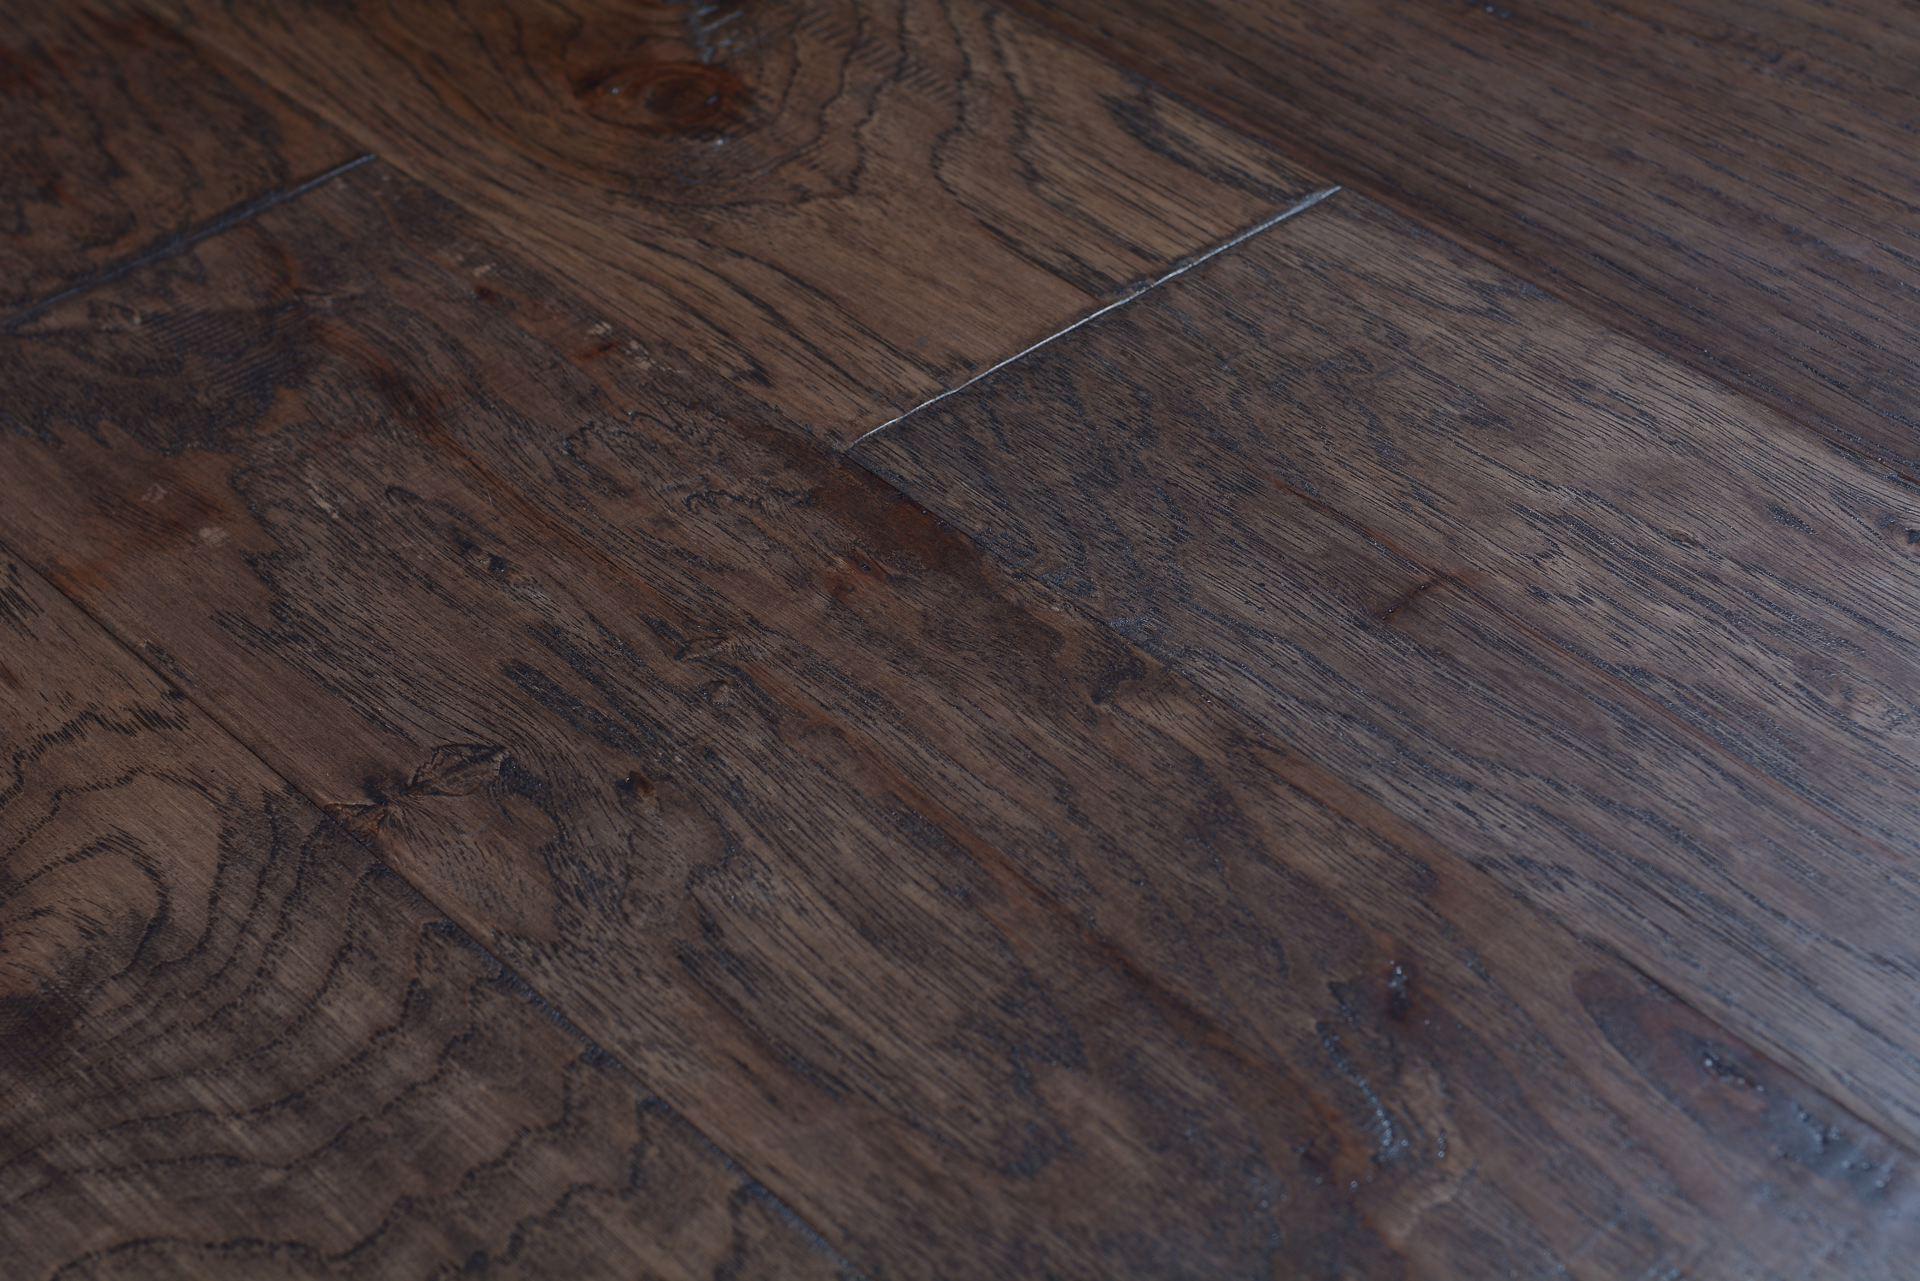 Engineered hardwood direct hardwood flooring charlotte for Direct hardwood flooring